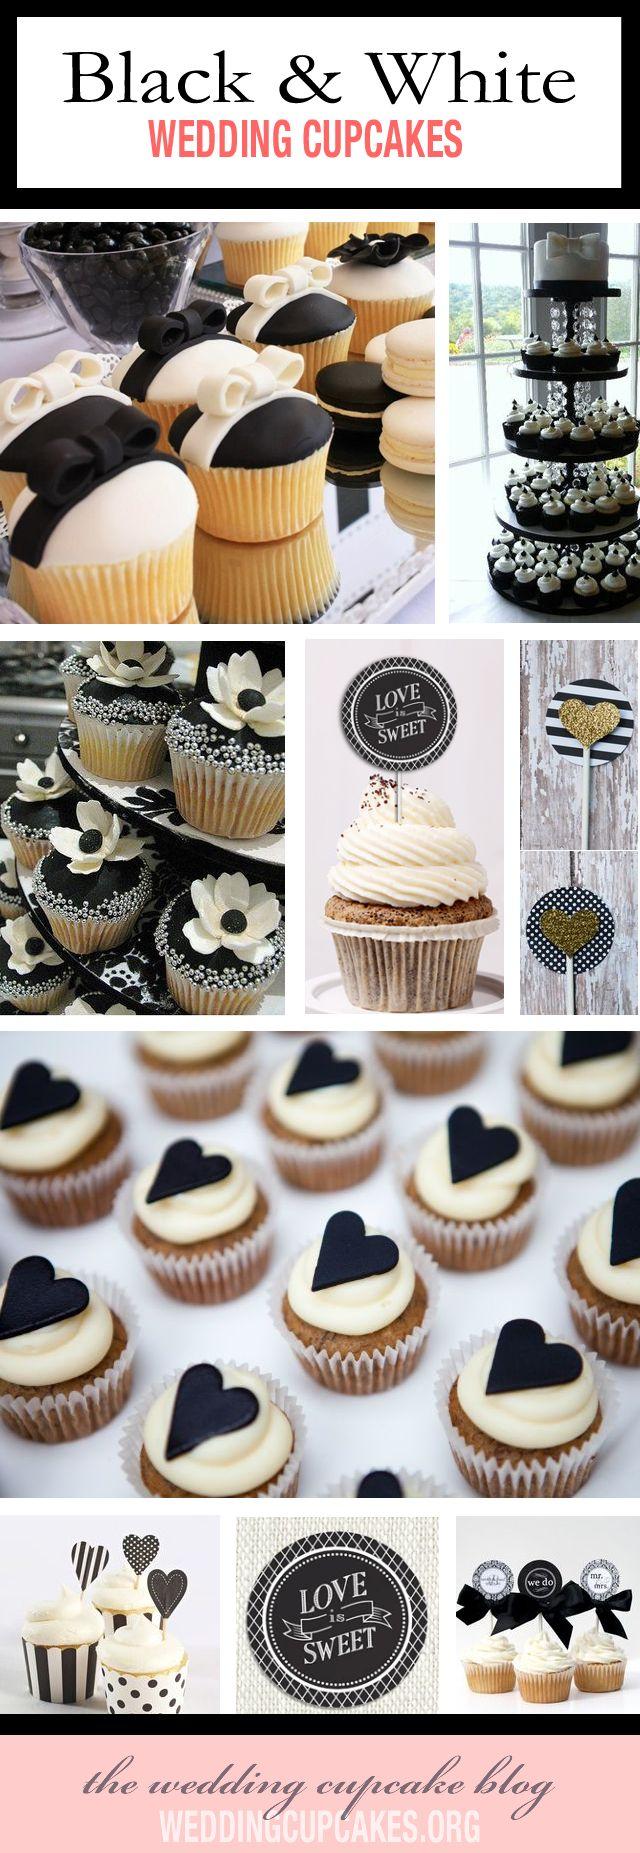 cupcake recipes for bridal shower%0A favoriteblackwhiteweddingcupcakes